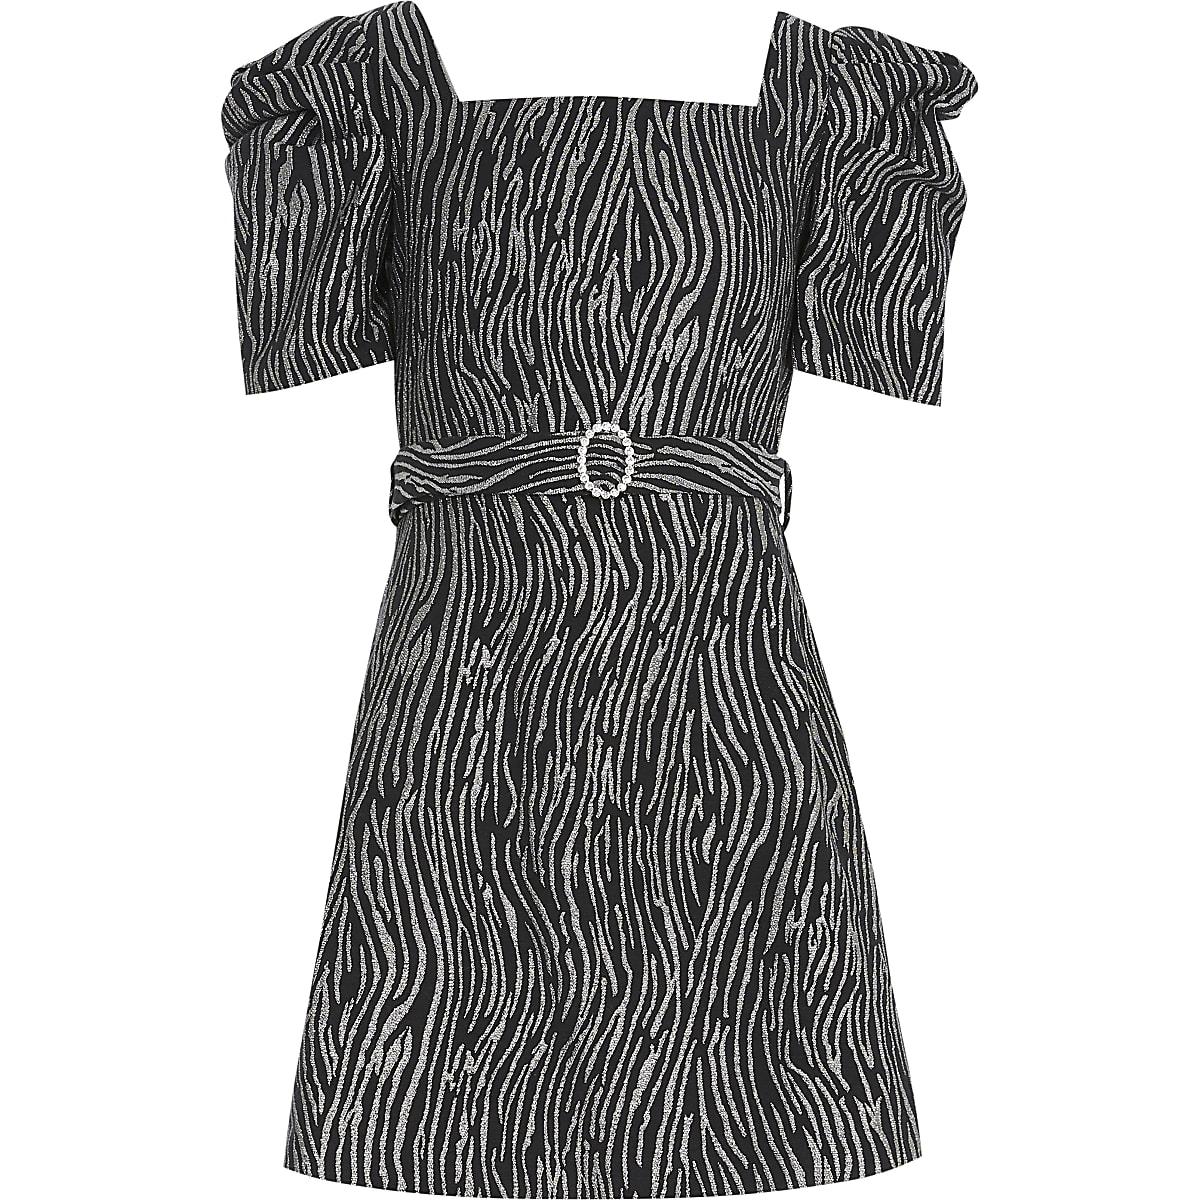 Girls zebra print puff sleeve skater dress